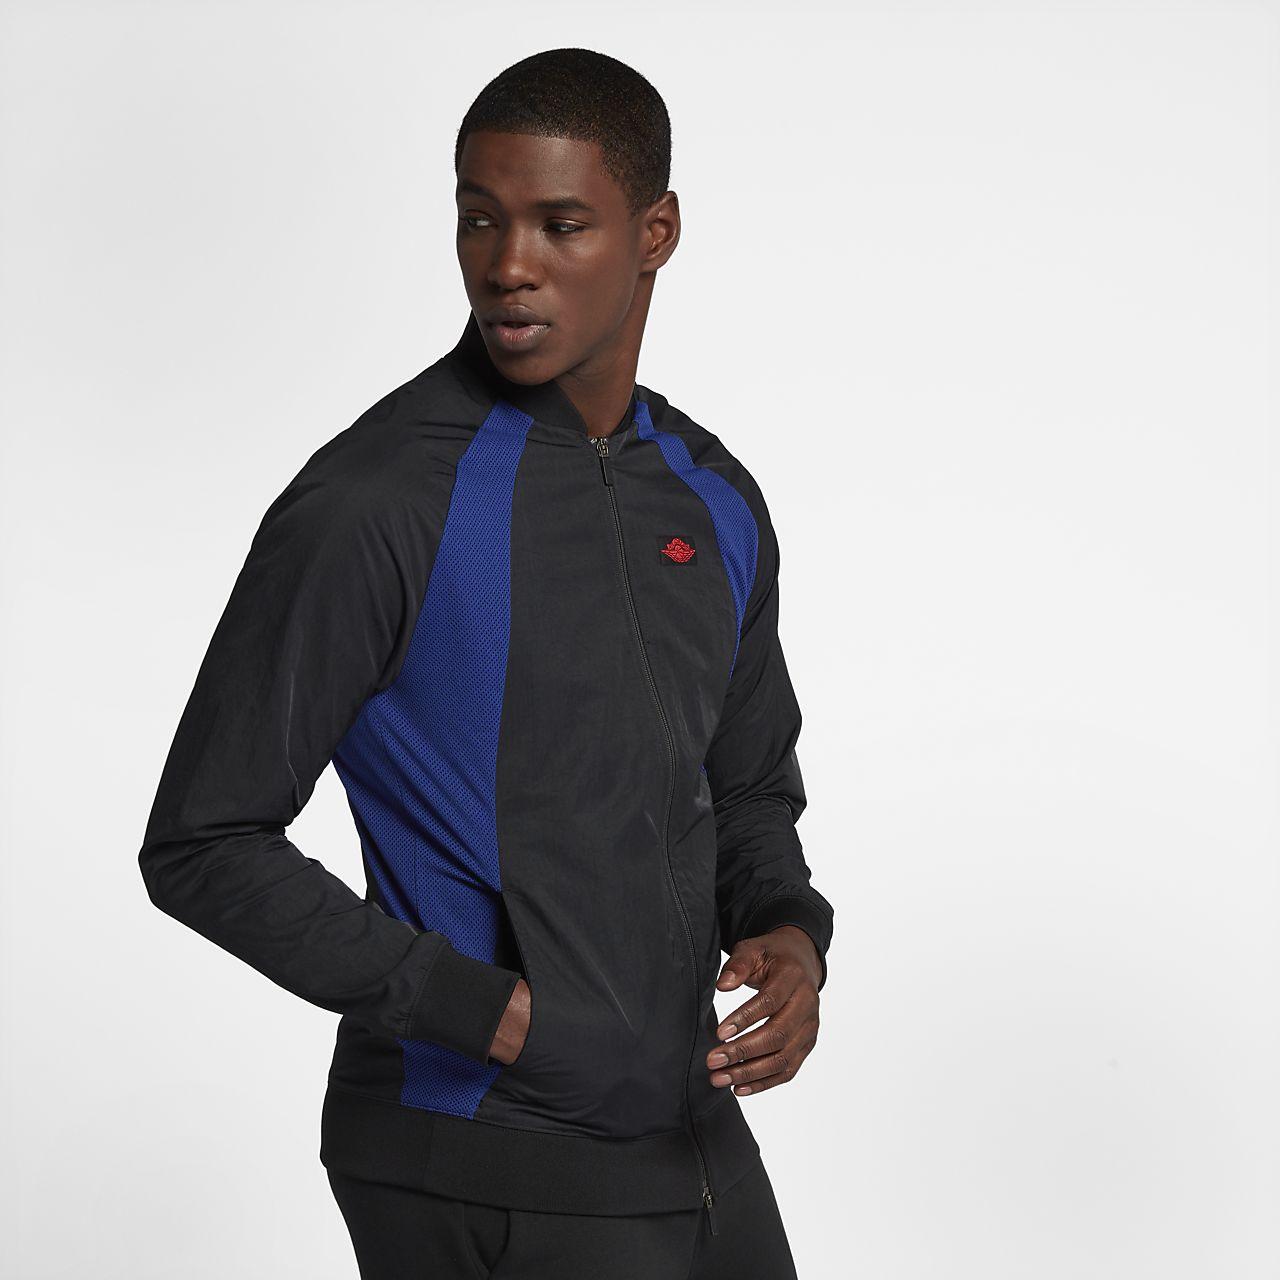 6fac2ccc0adf8e Air Jordan 1 Wings Men s Jacket. Nike.com ZA